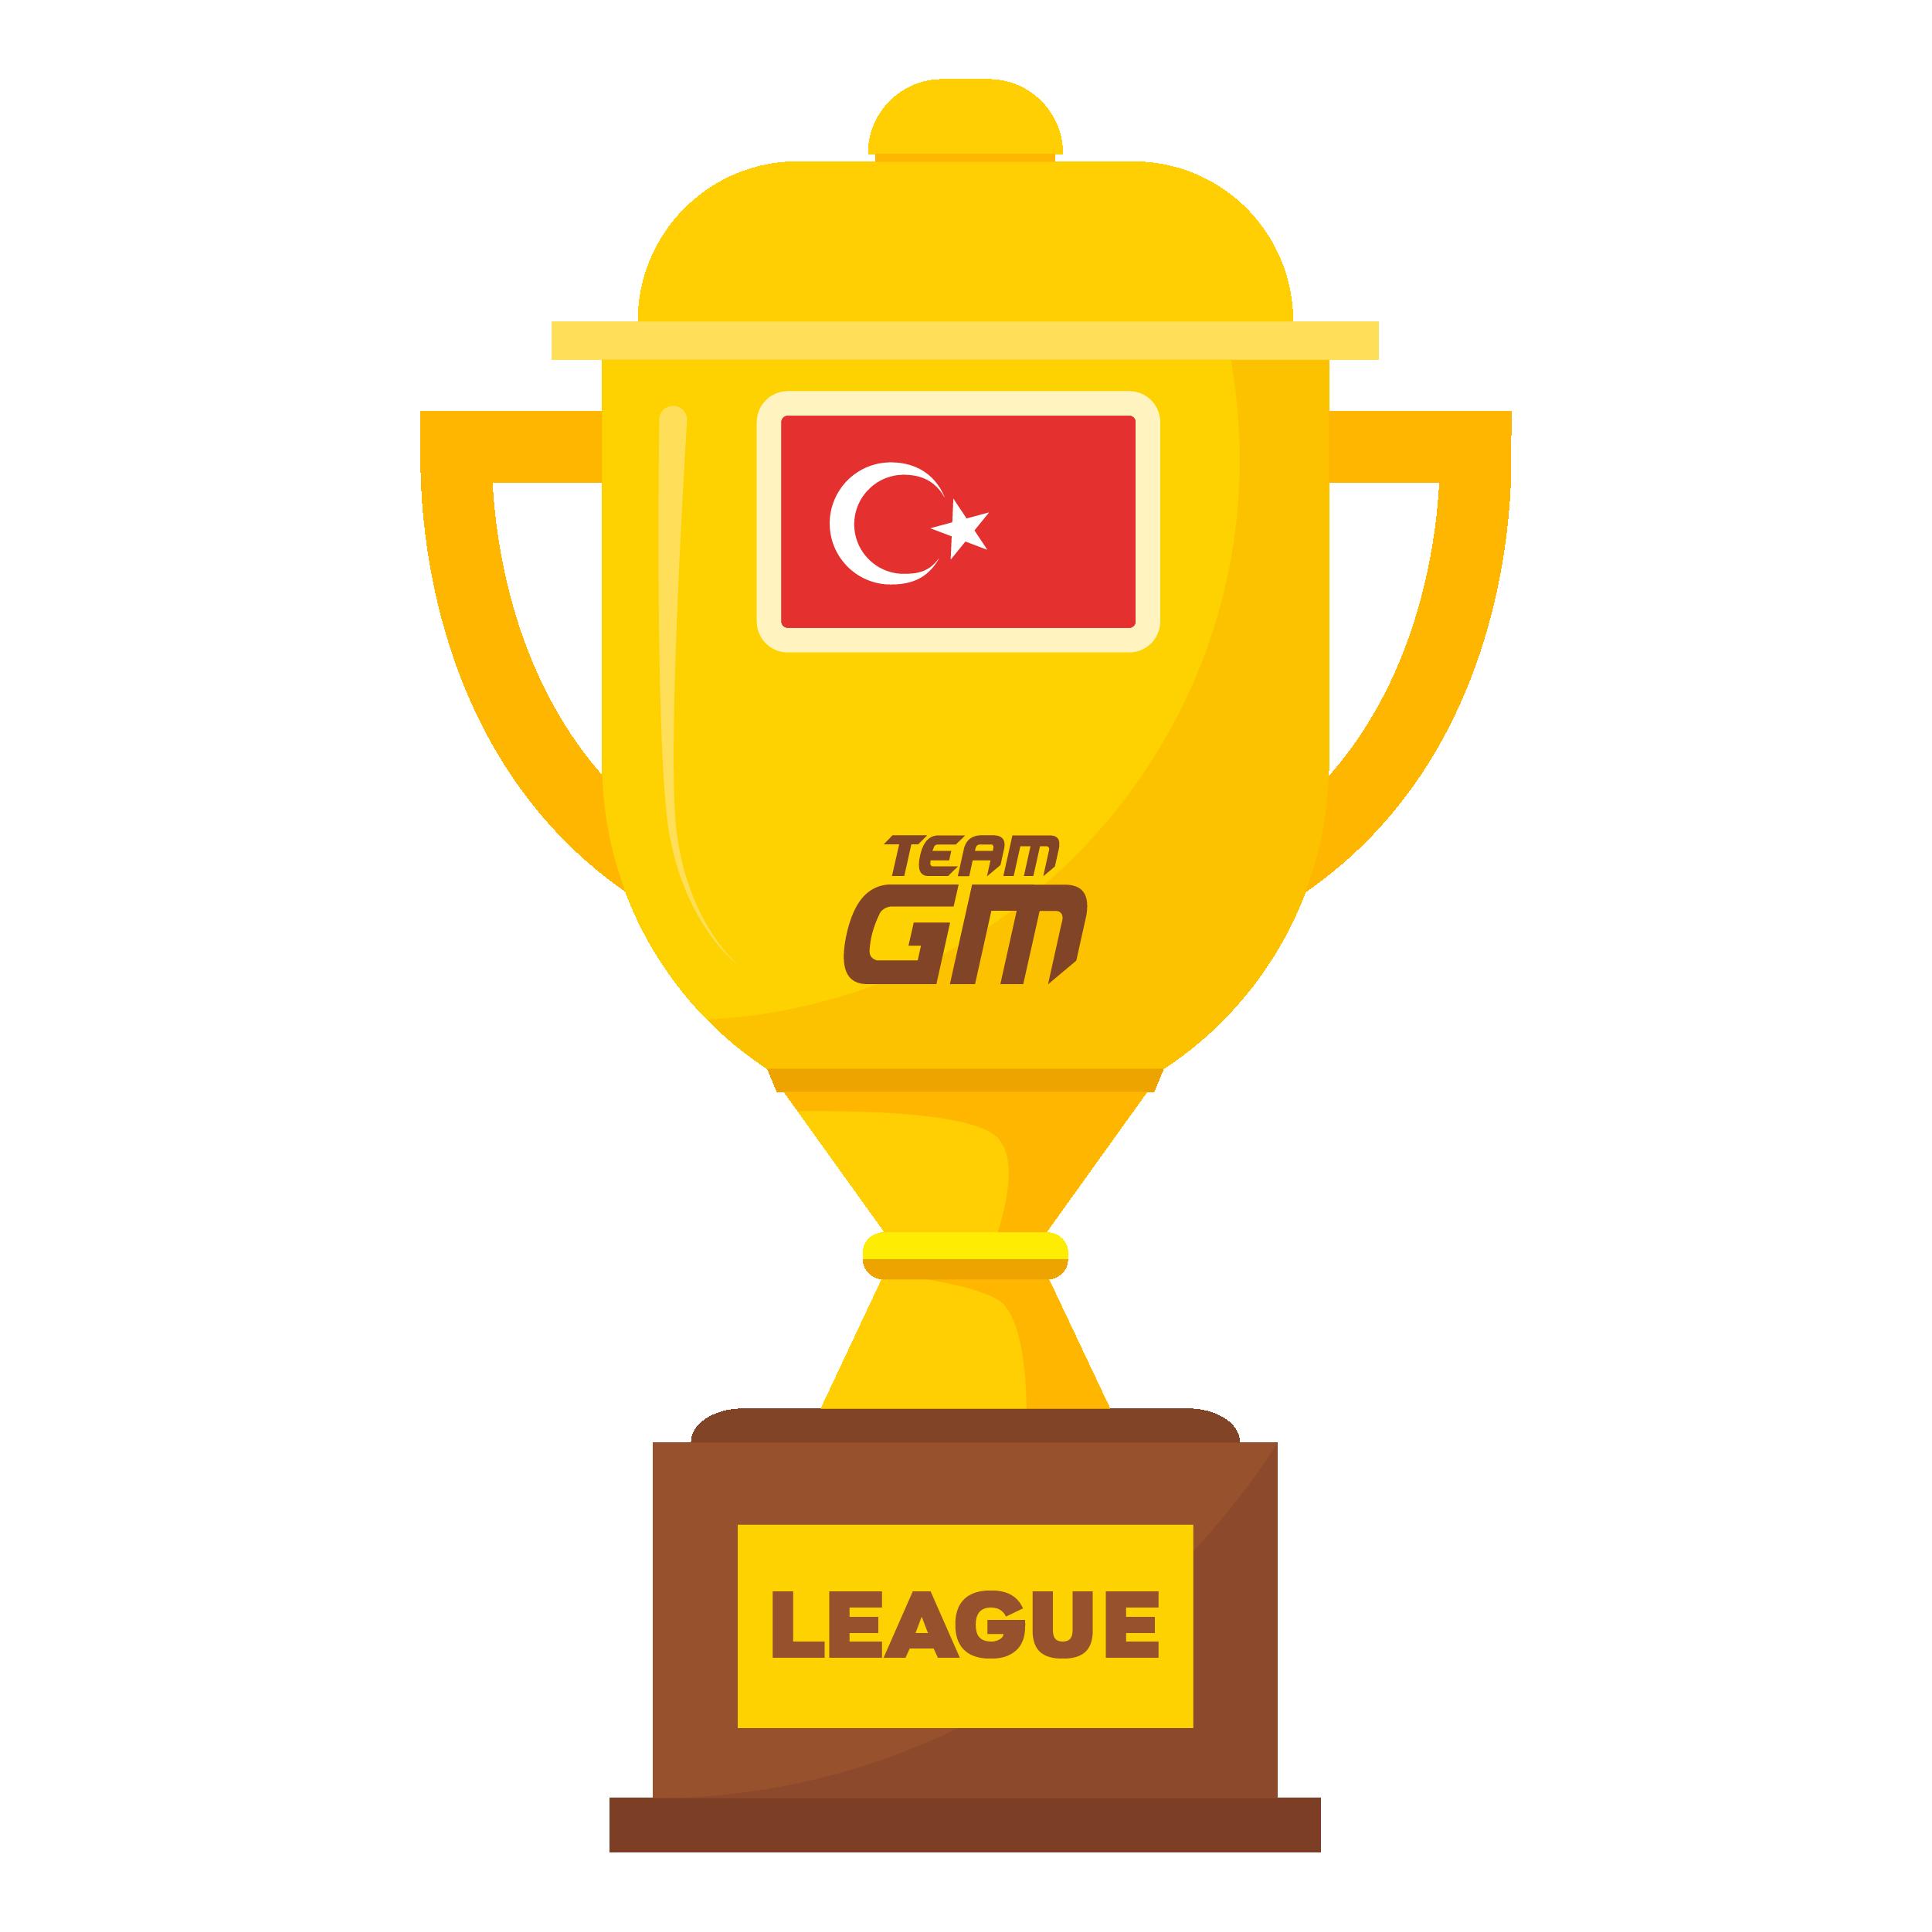 1ST - TURKISH LEAGUE